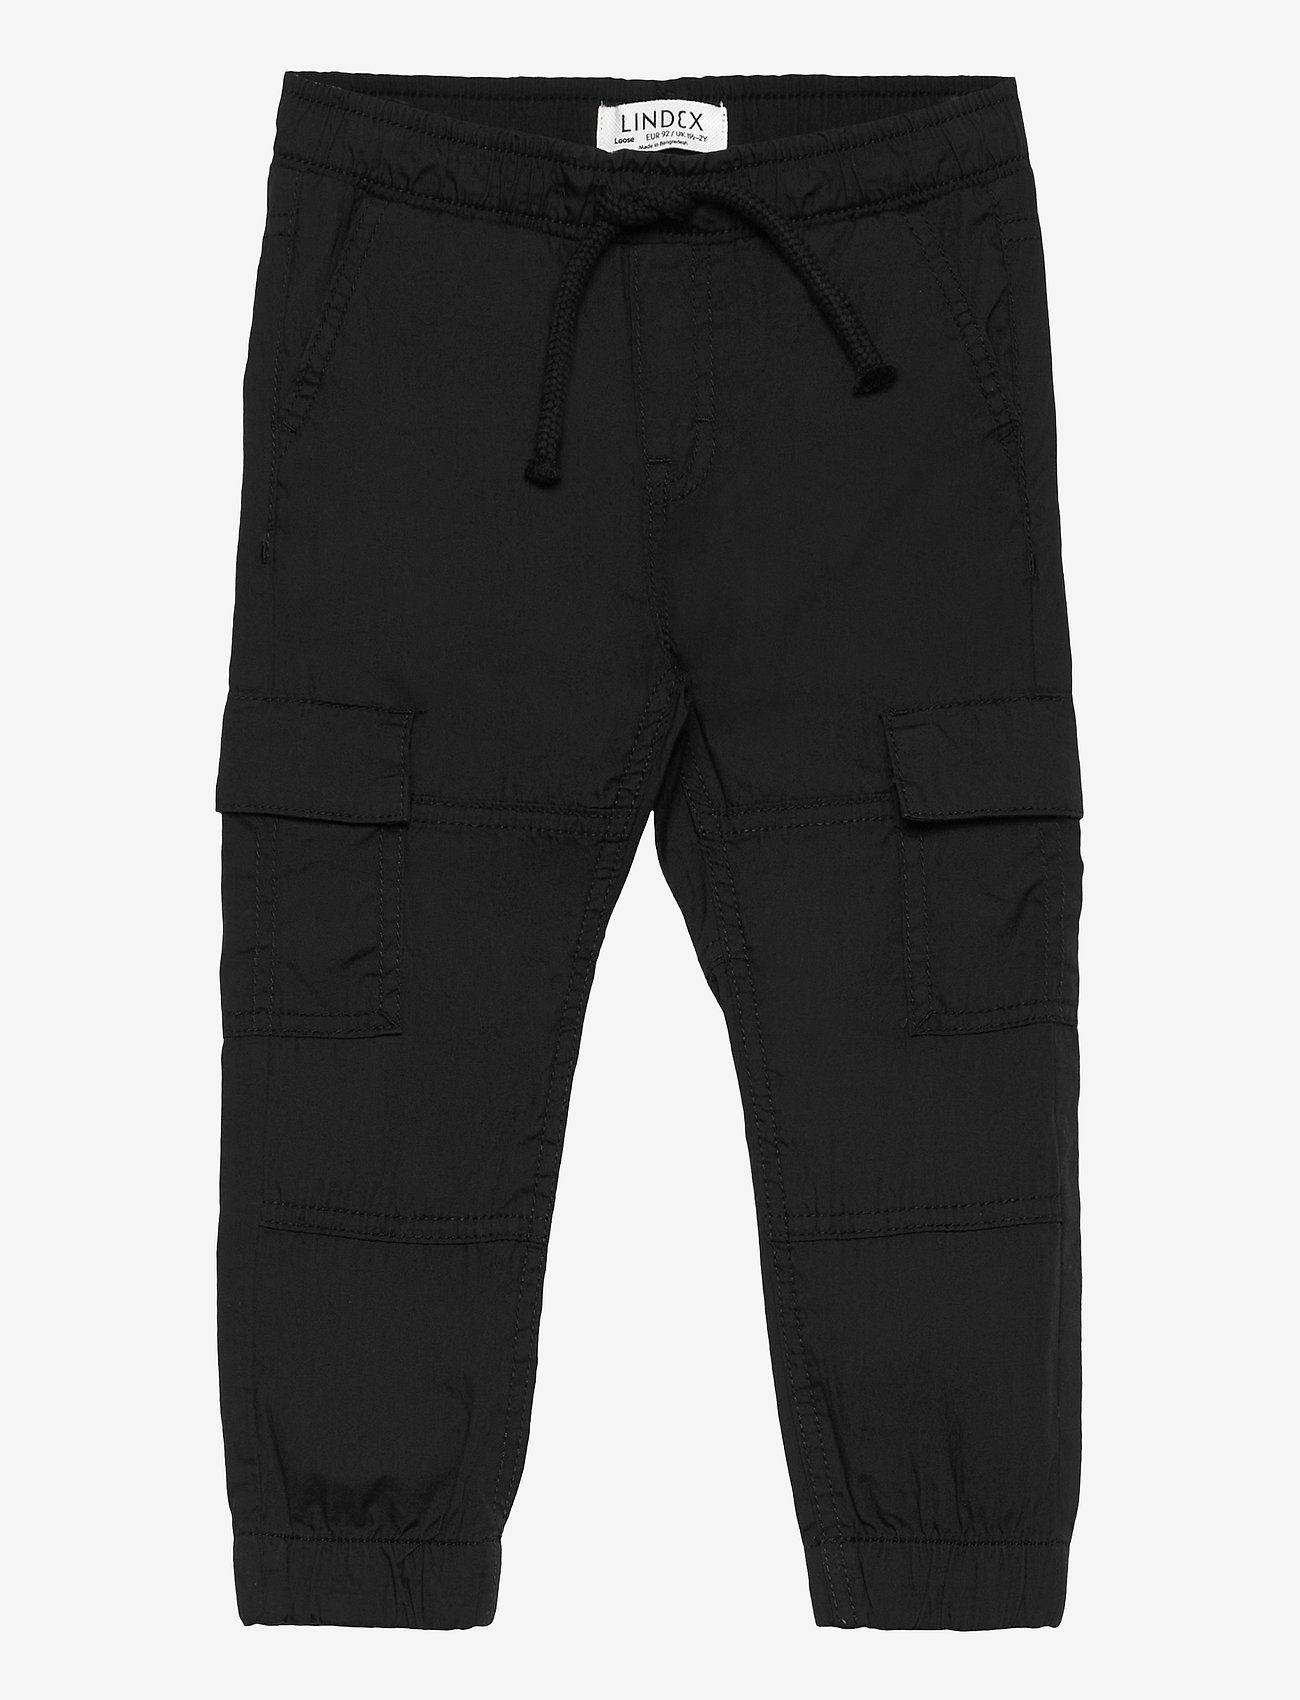 Lindex - Trousers Pelle cargo - trousers - black - 0